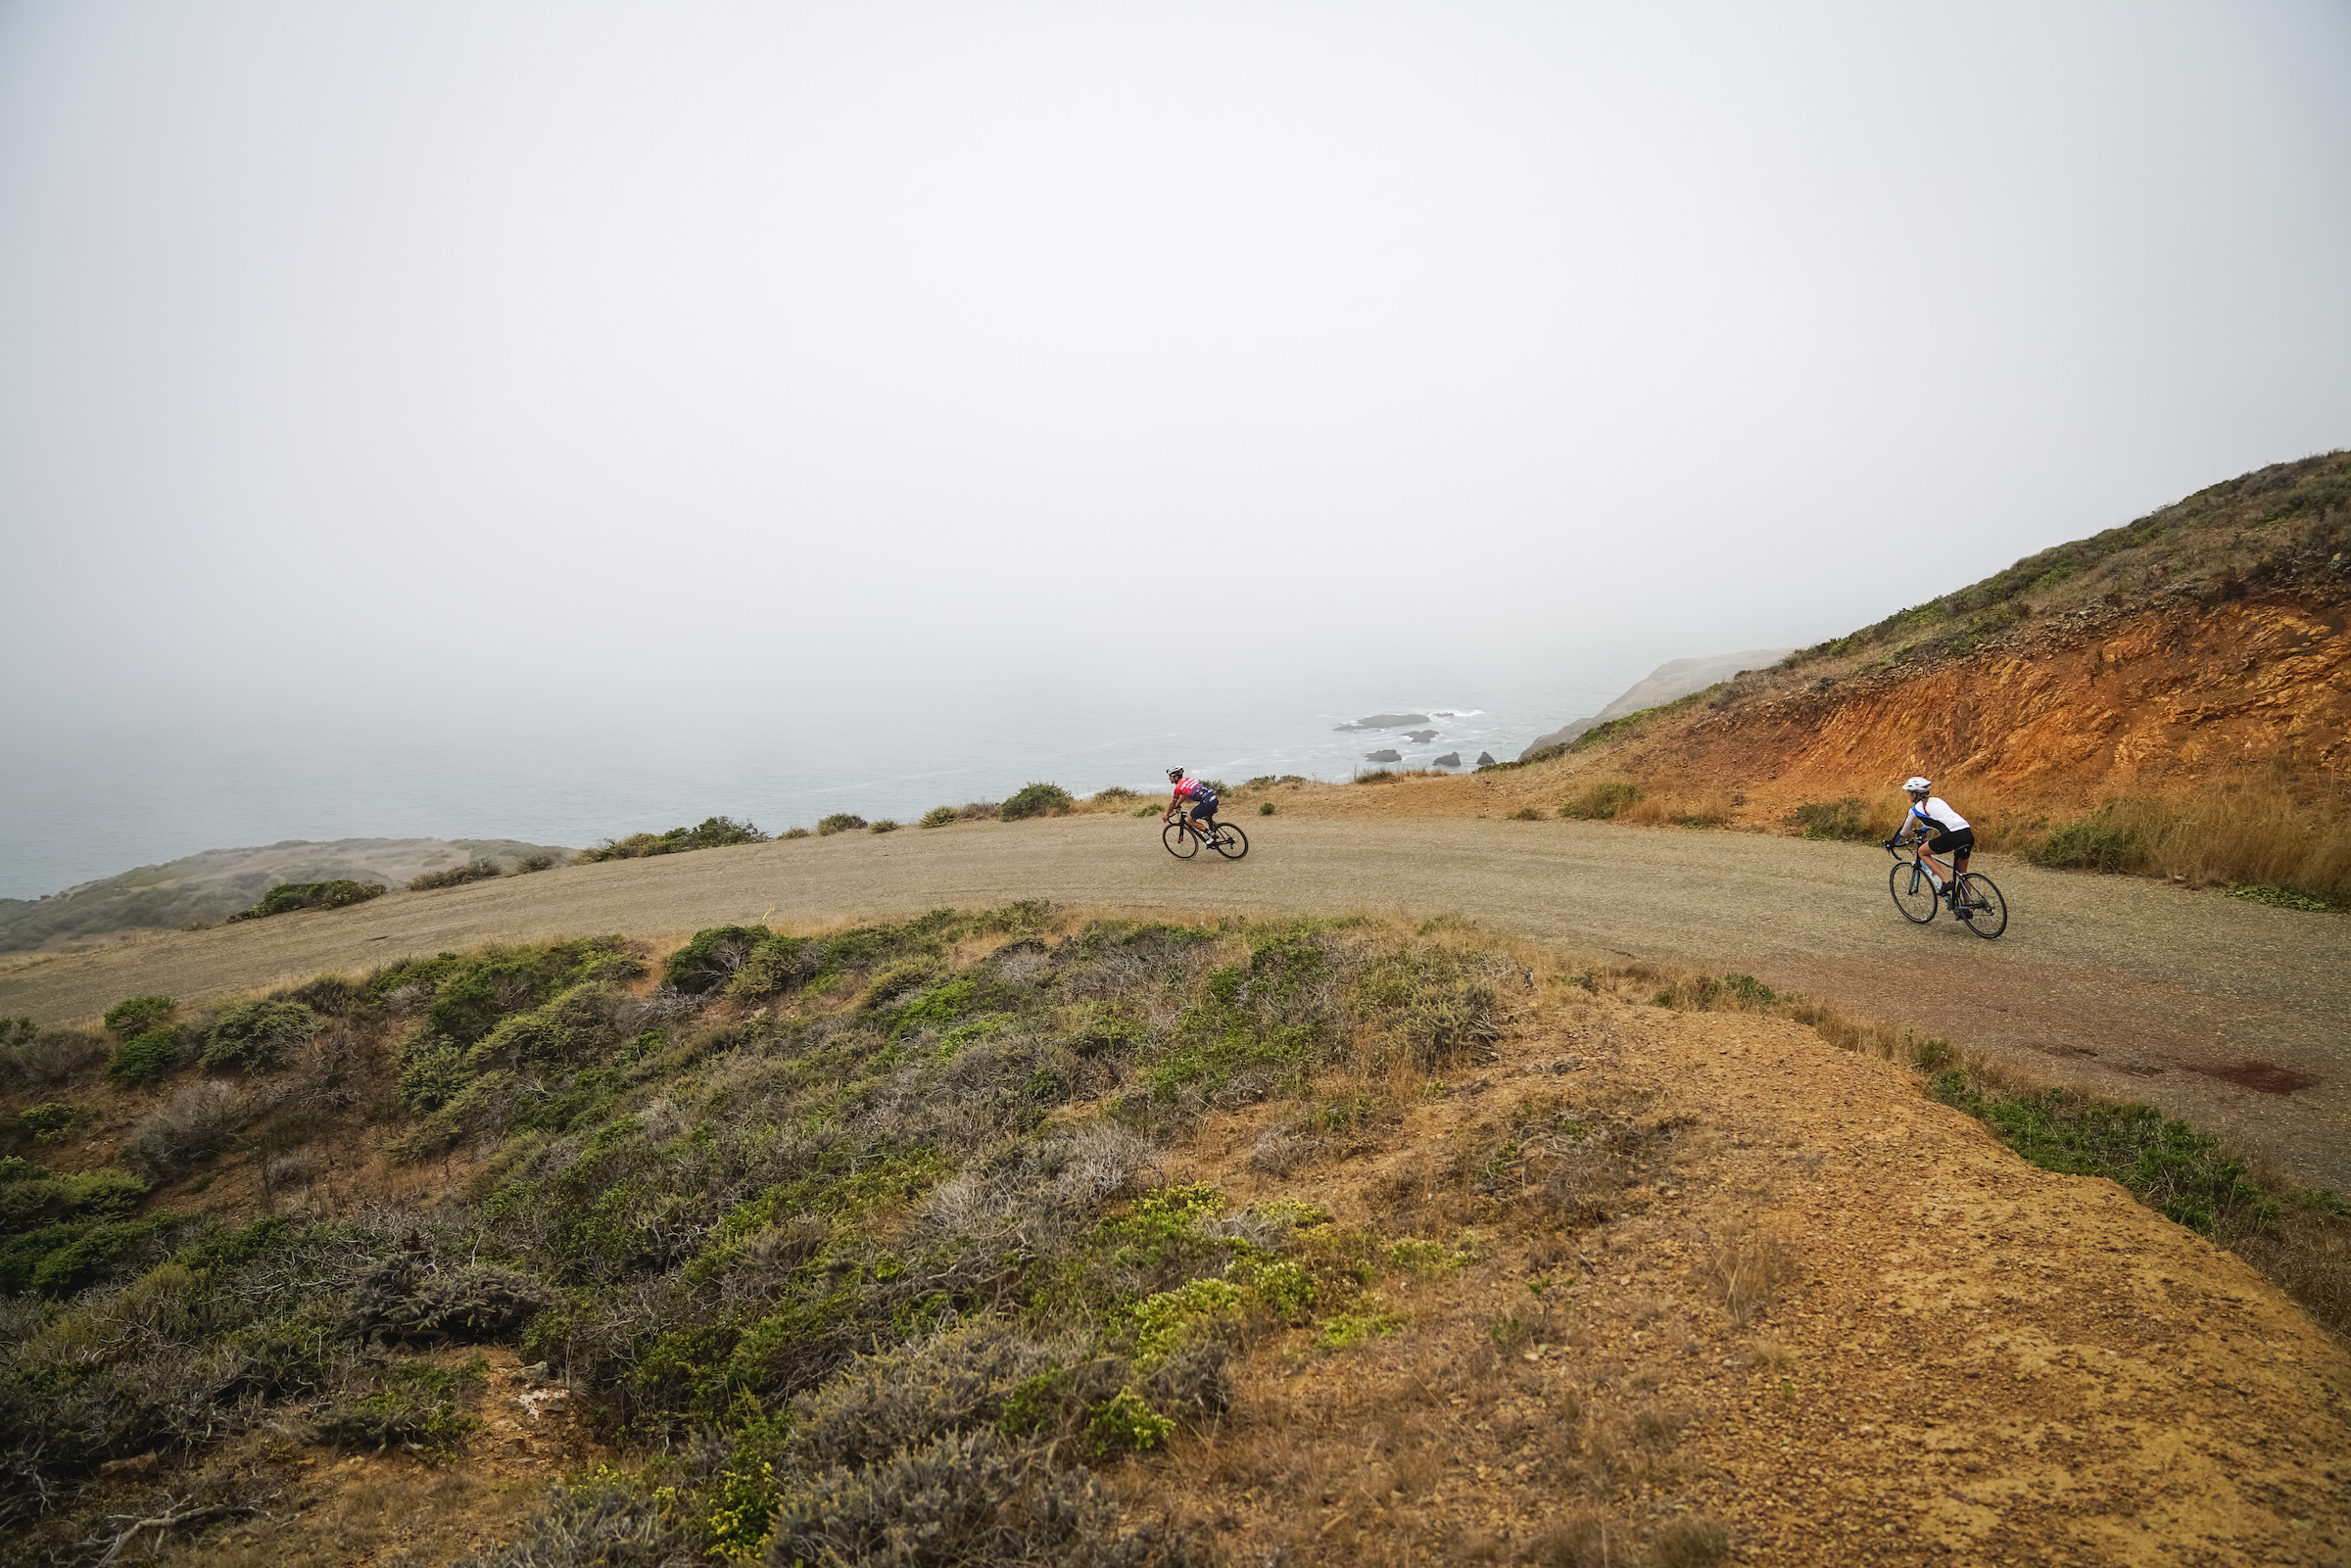 dirt biking_small.jpg